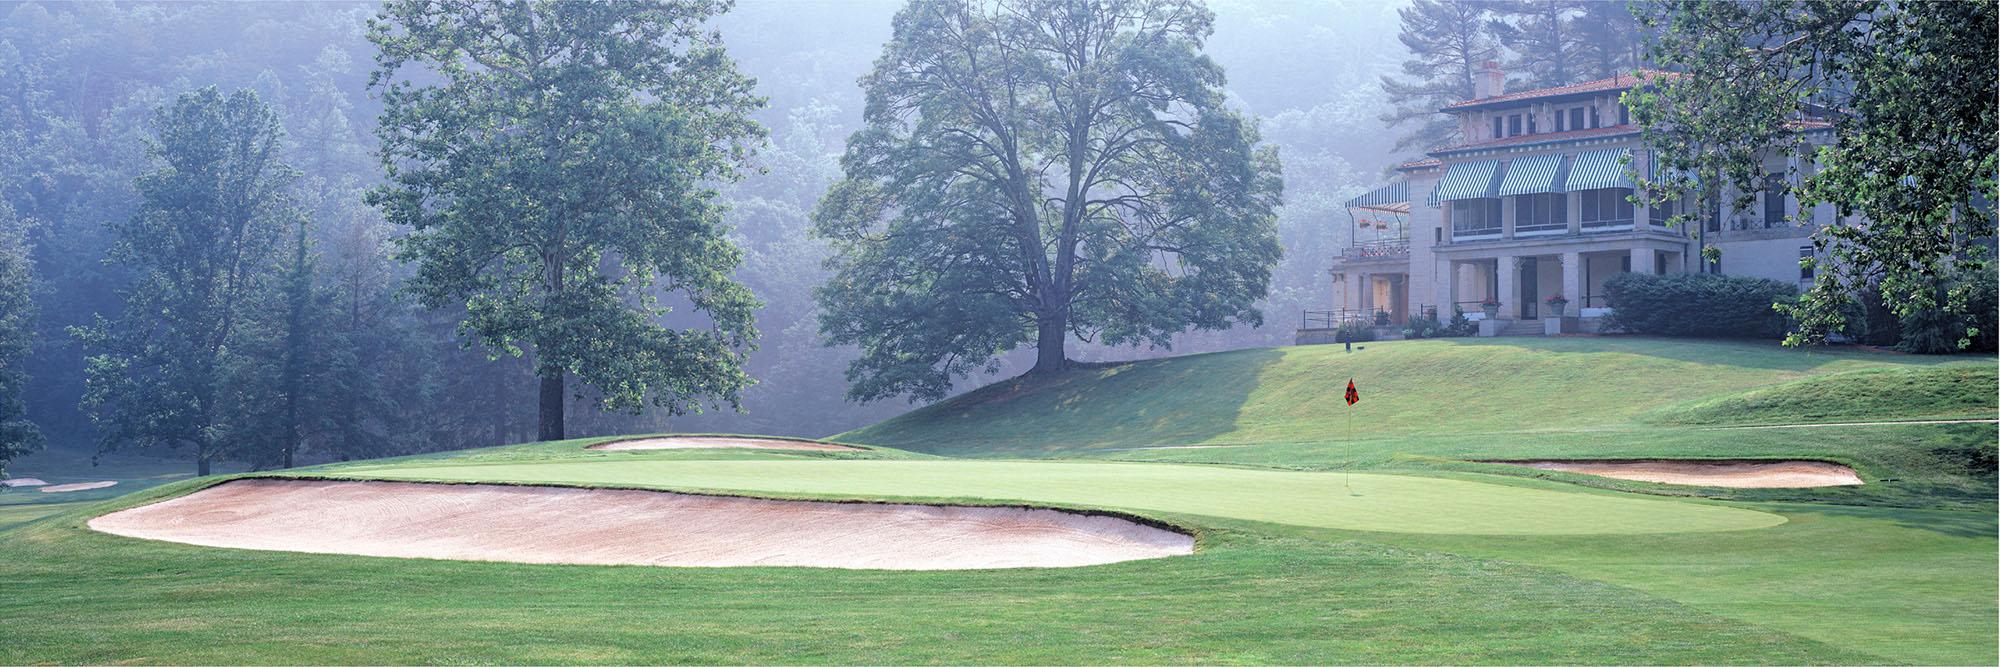 Golf Course Image - Homestead Cascades No. 15